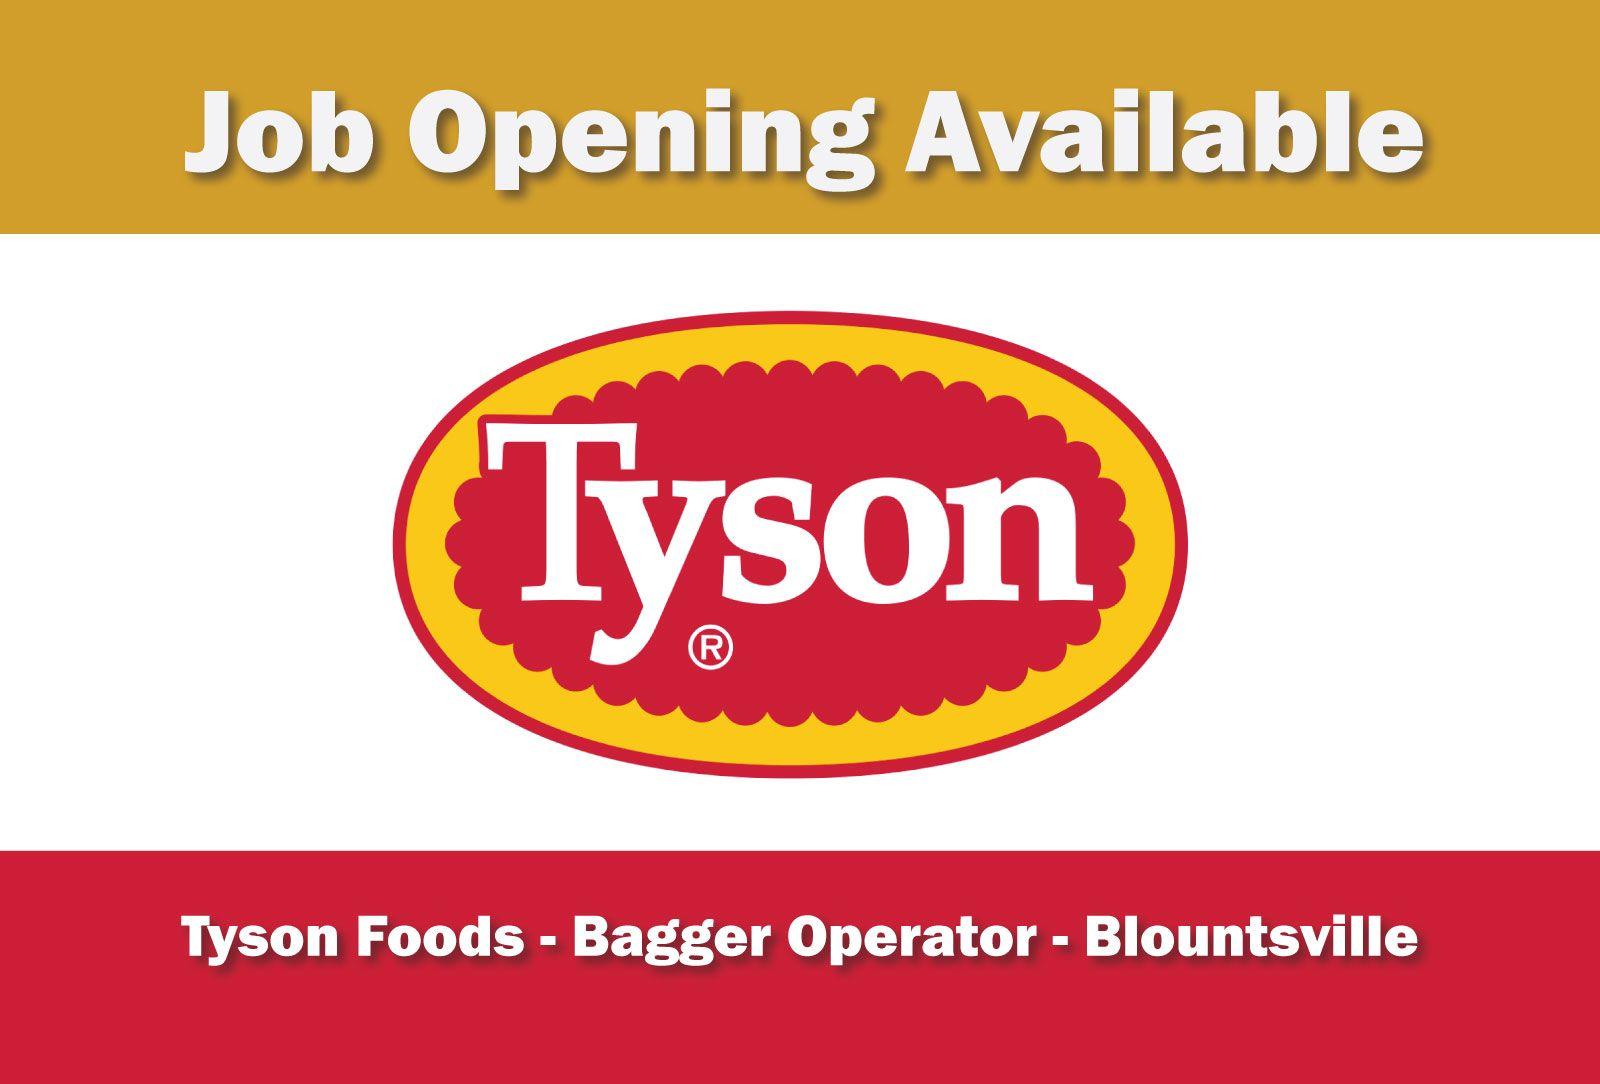 Job Opening Available Tyson Foods Bagger Operator Blountsville Jobsearch Https Www Facebook Com Cullmantoday Posts 1 Tyson Foods Logo Food Job Opening